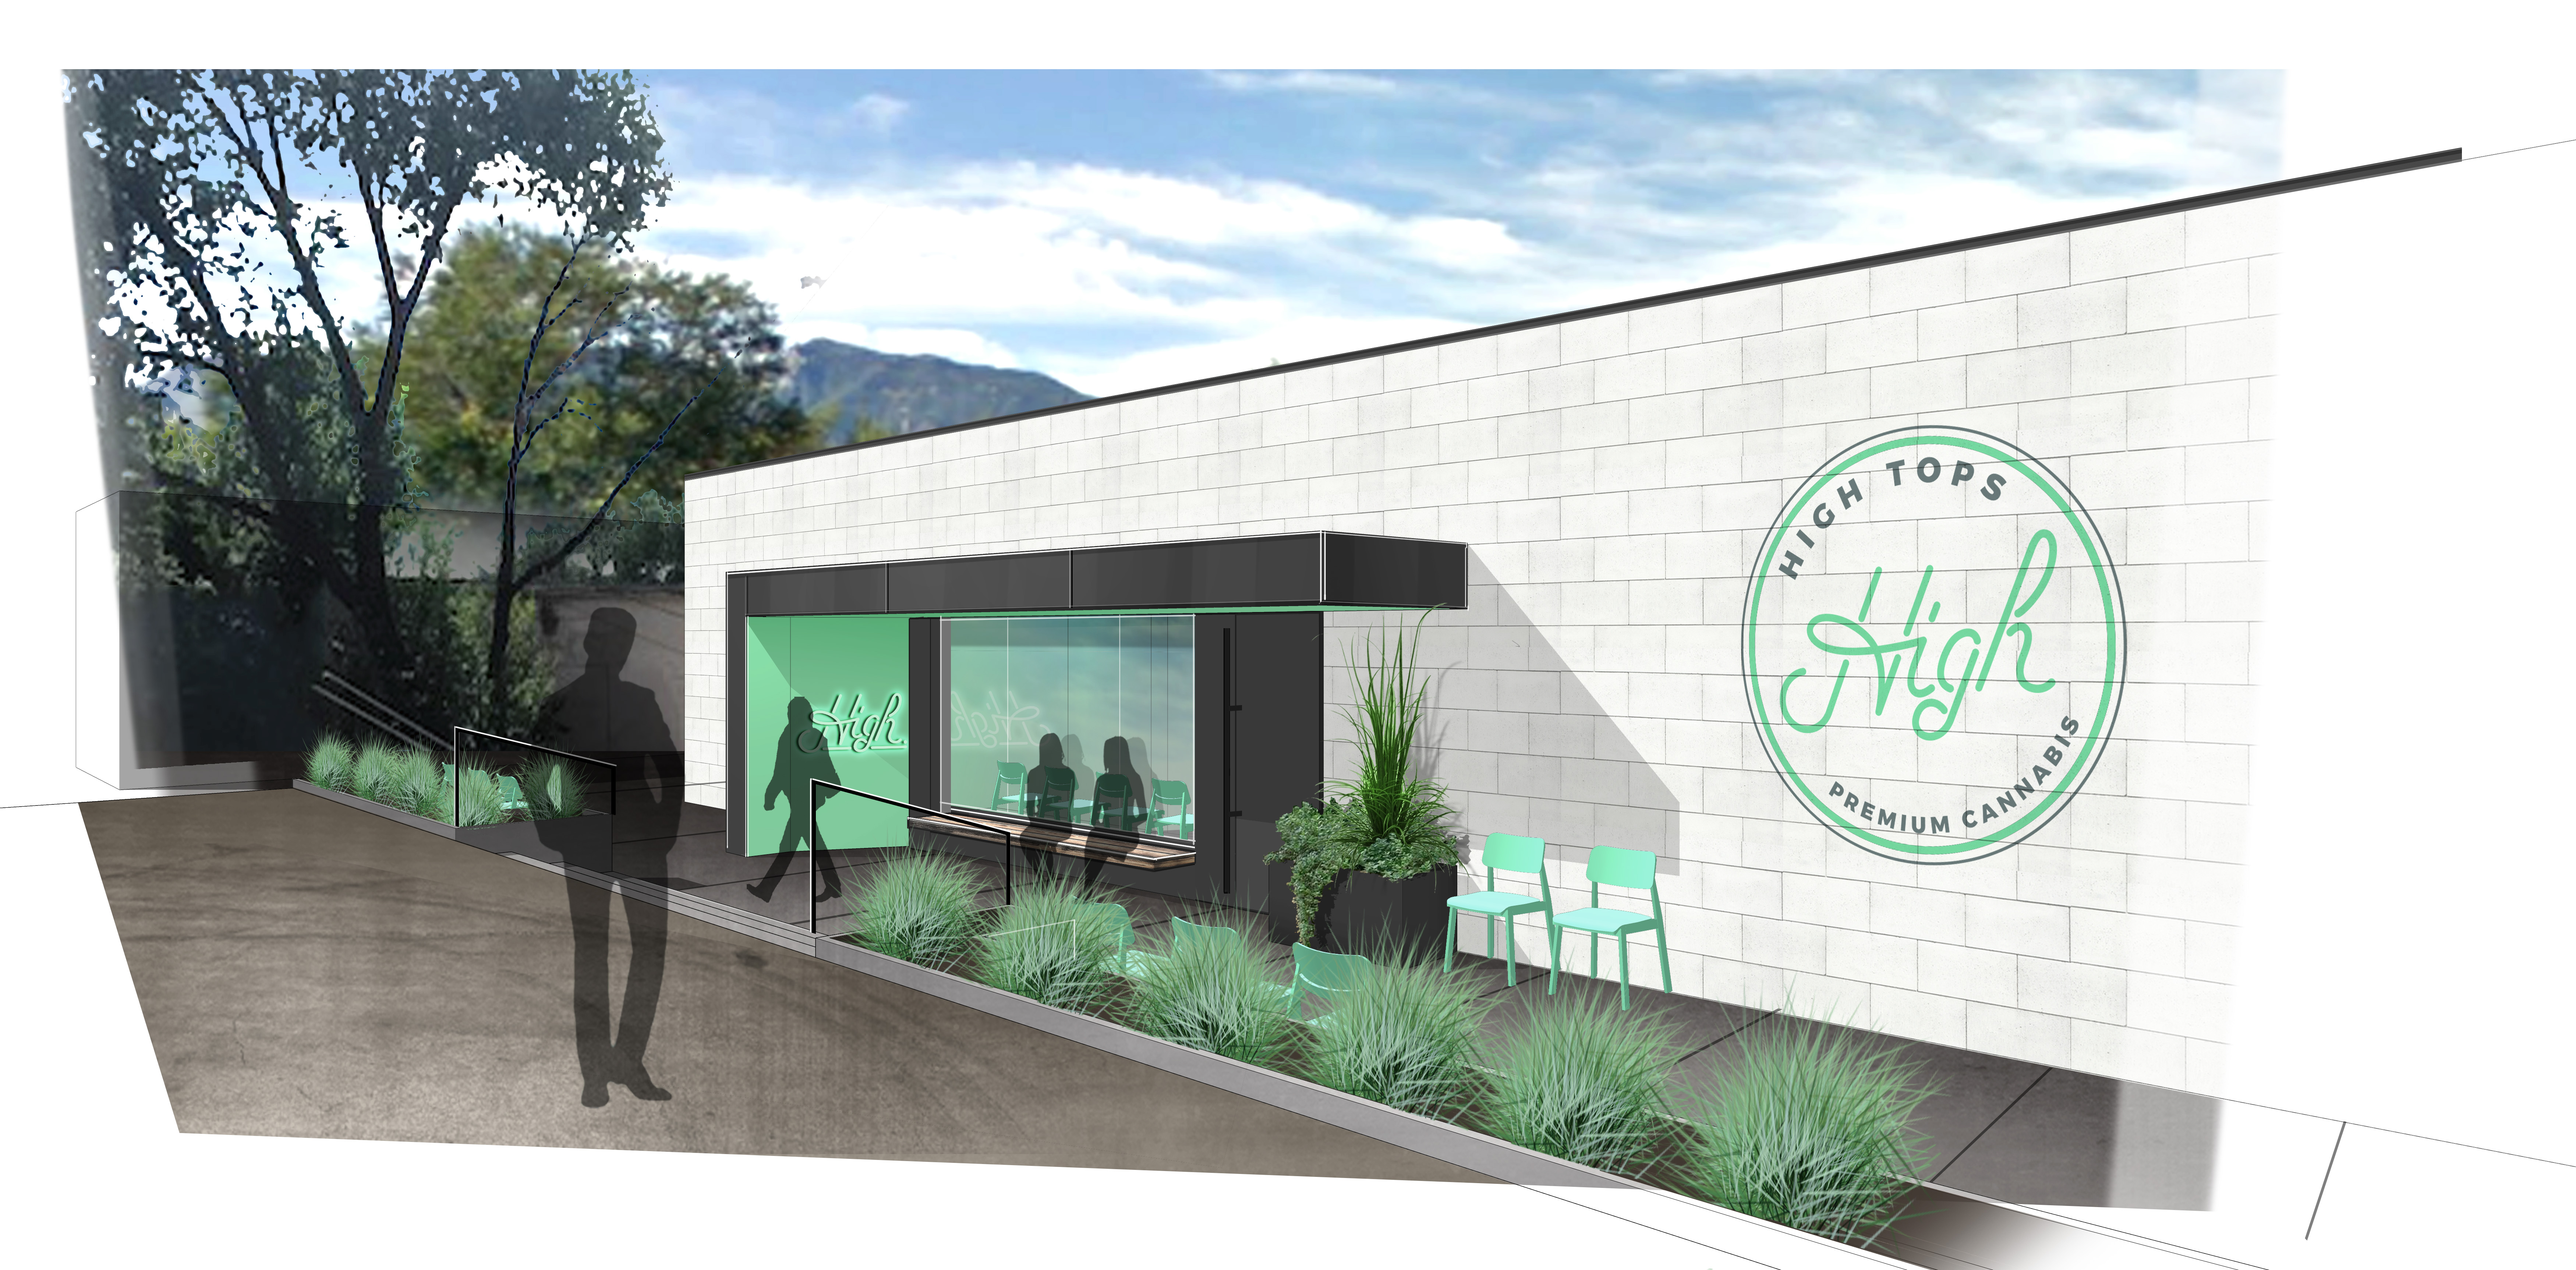 Hightops - Coming Soon - High Road Studio